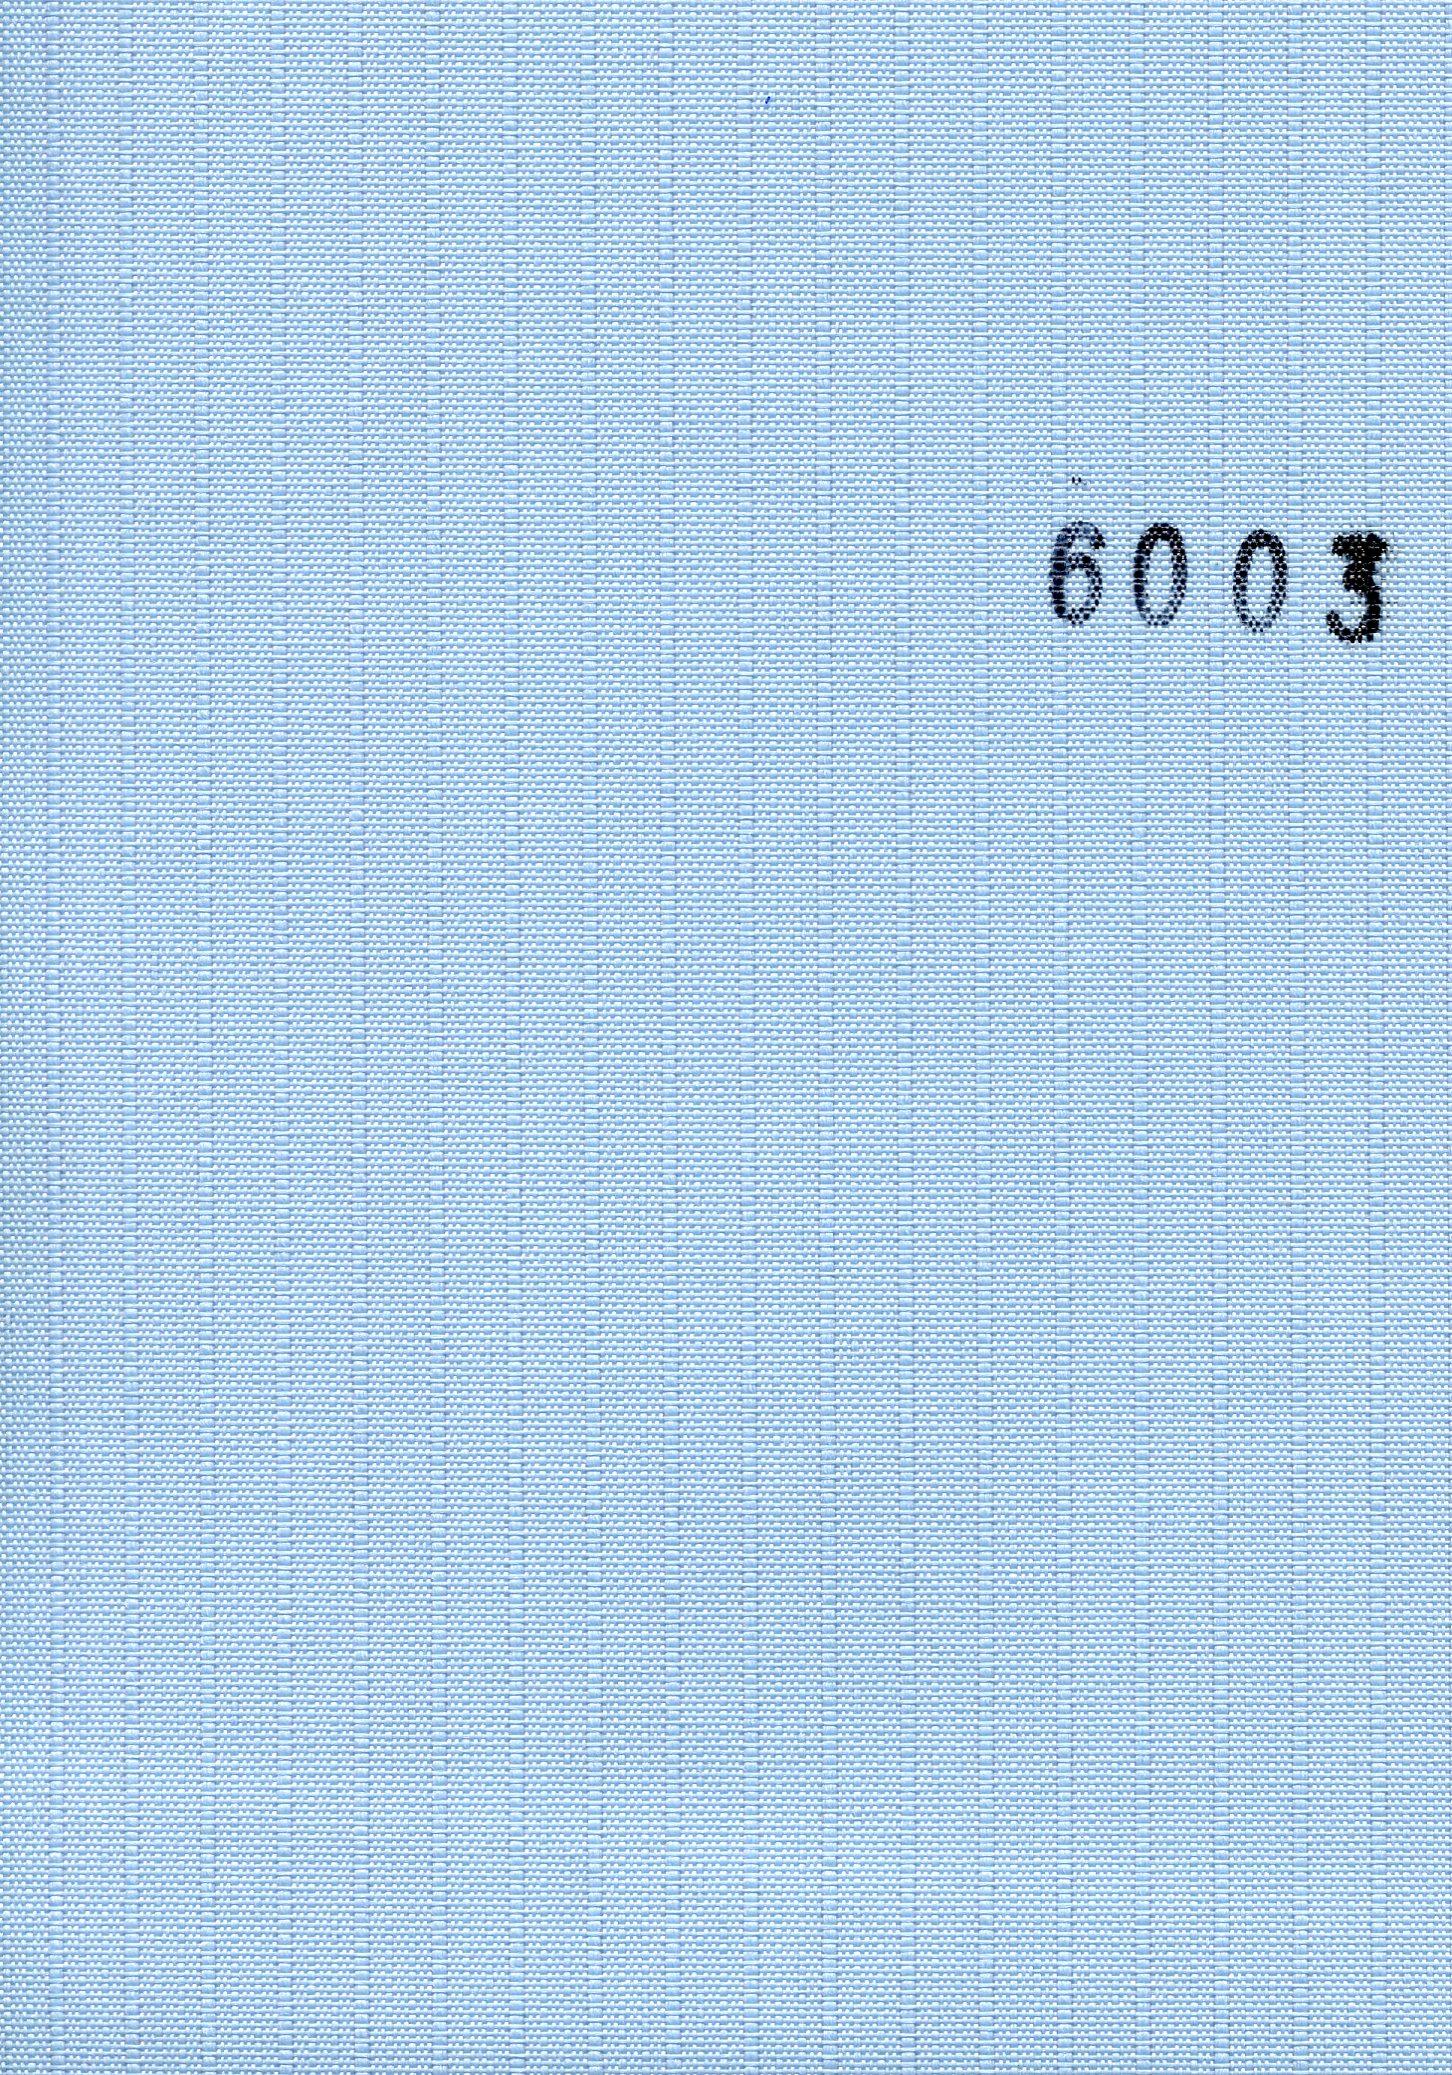 Line 6003